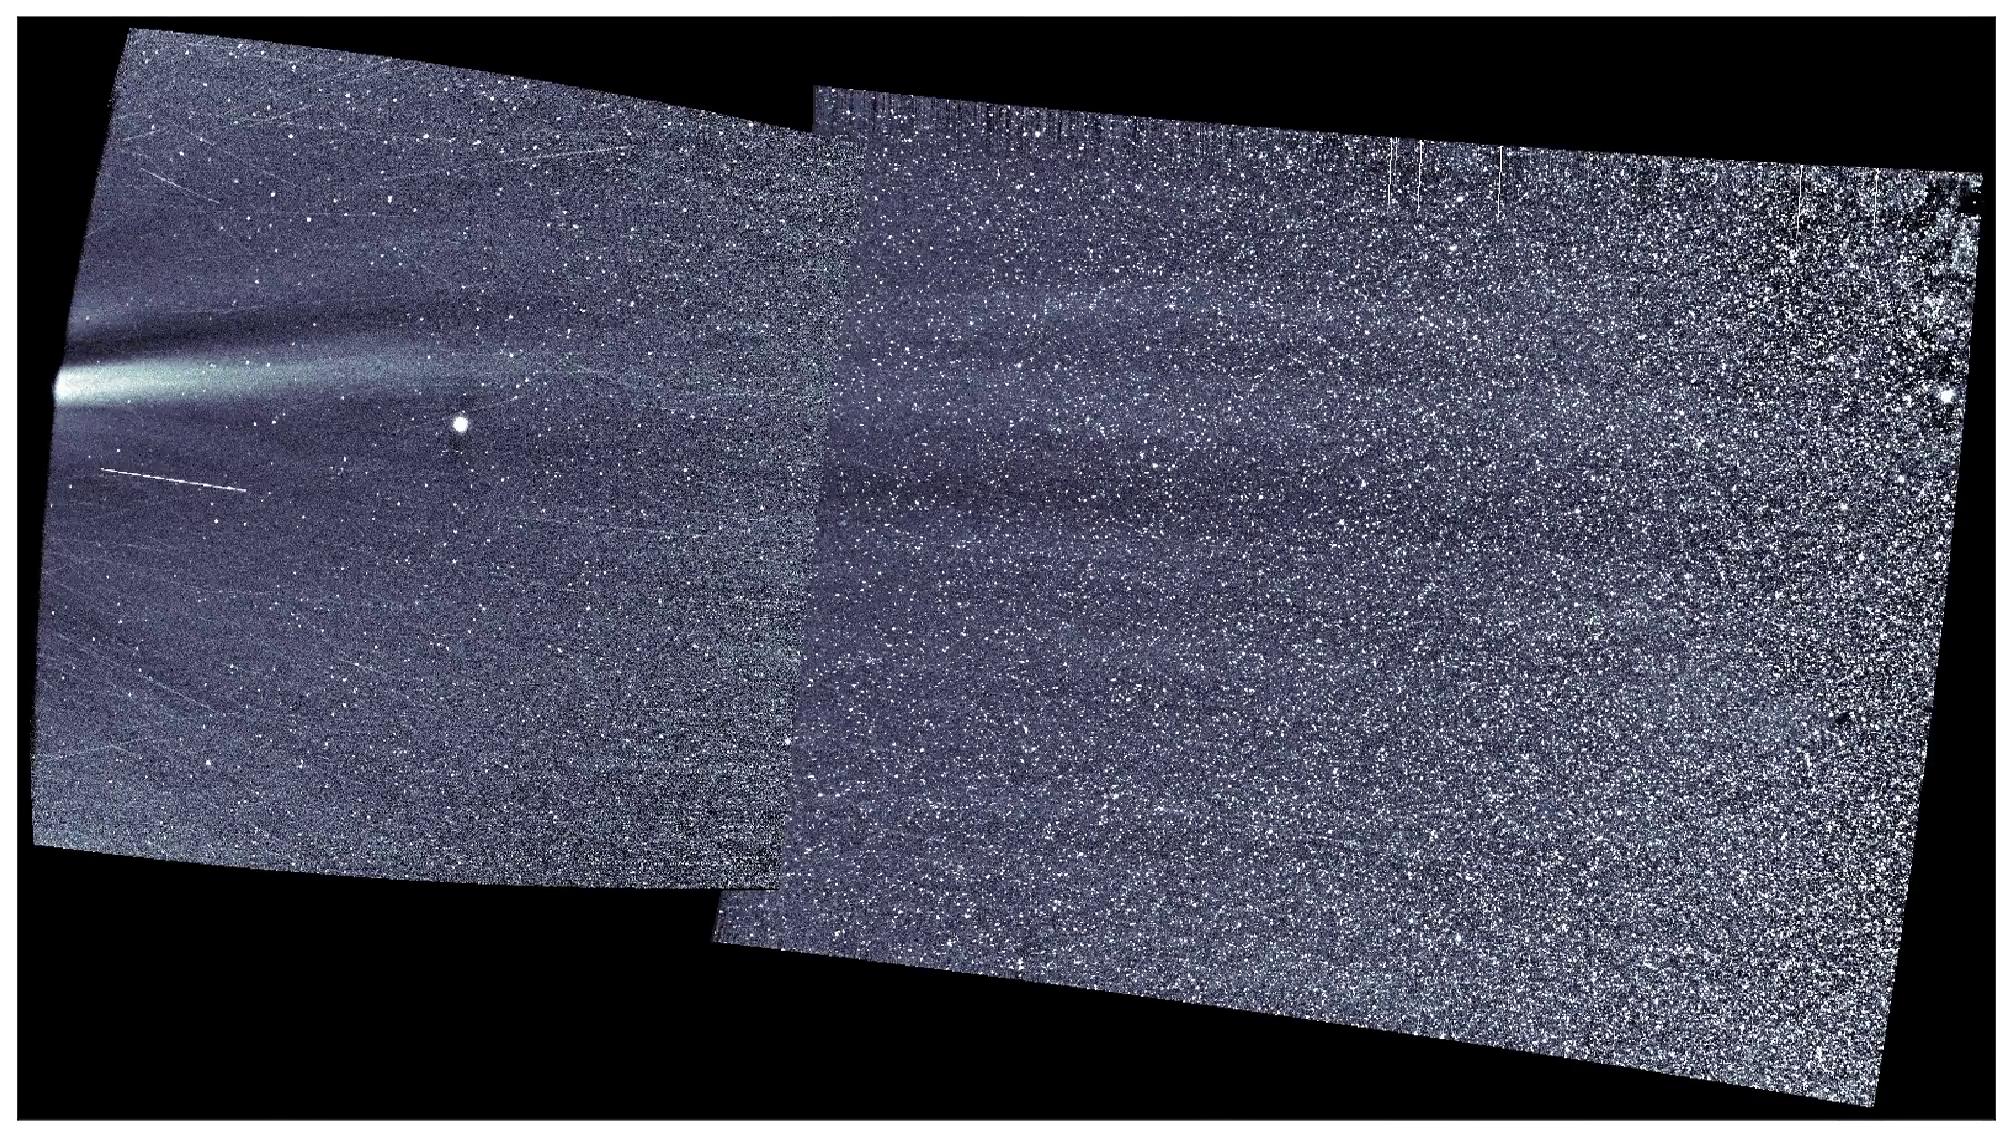 NASA SOCHEAZA Lumea INTREAGA cu o NOUA IMAGINE despre SOARE parker